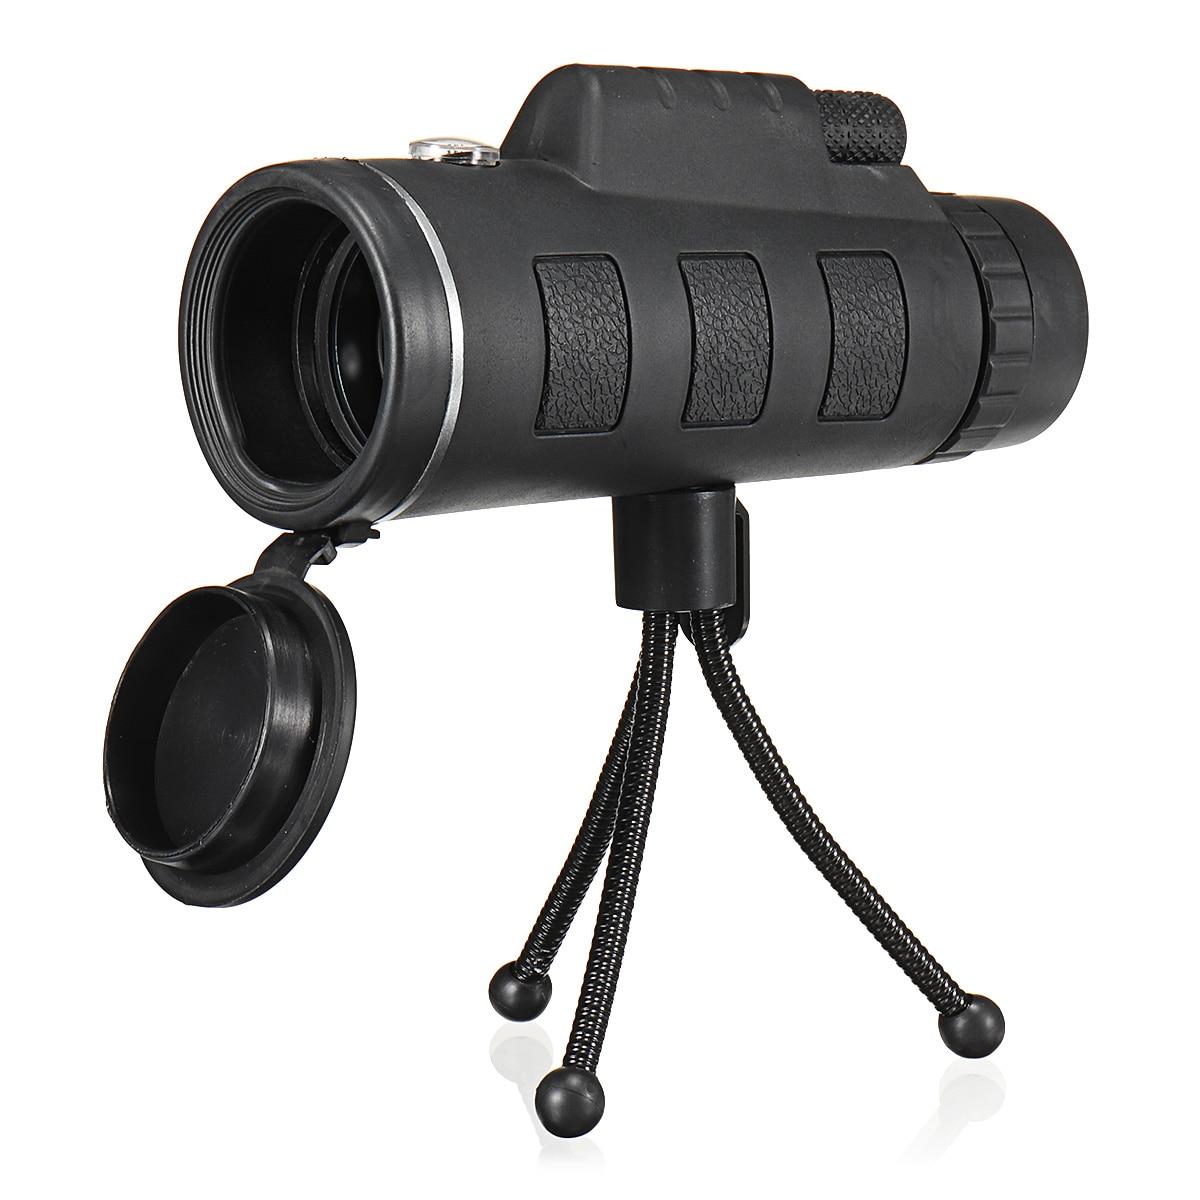 telescope telephoto zoom photo camera lens for smartphones